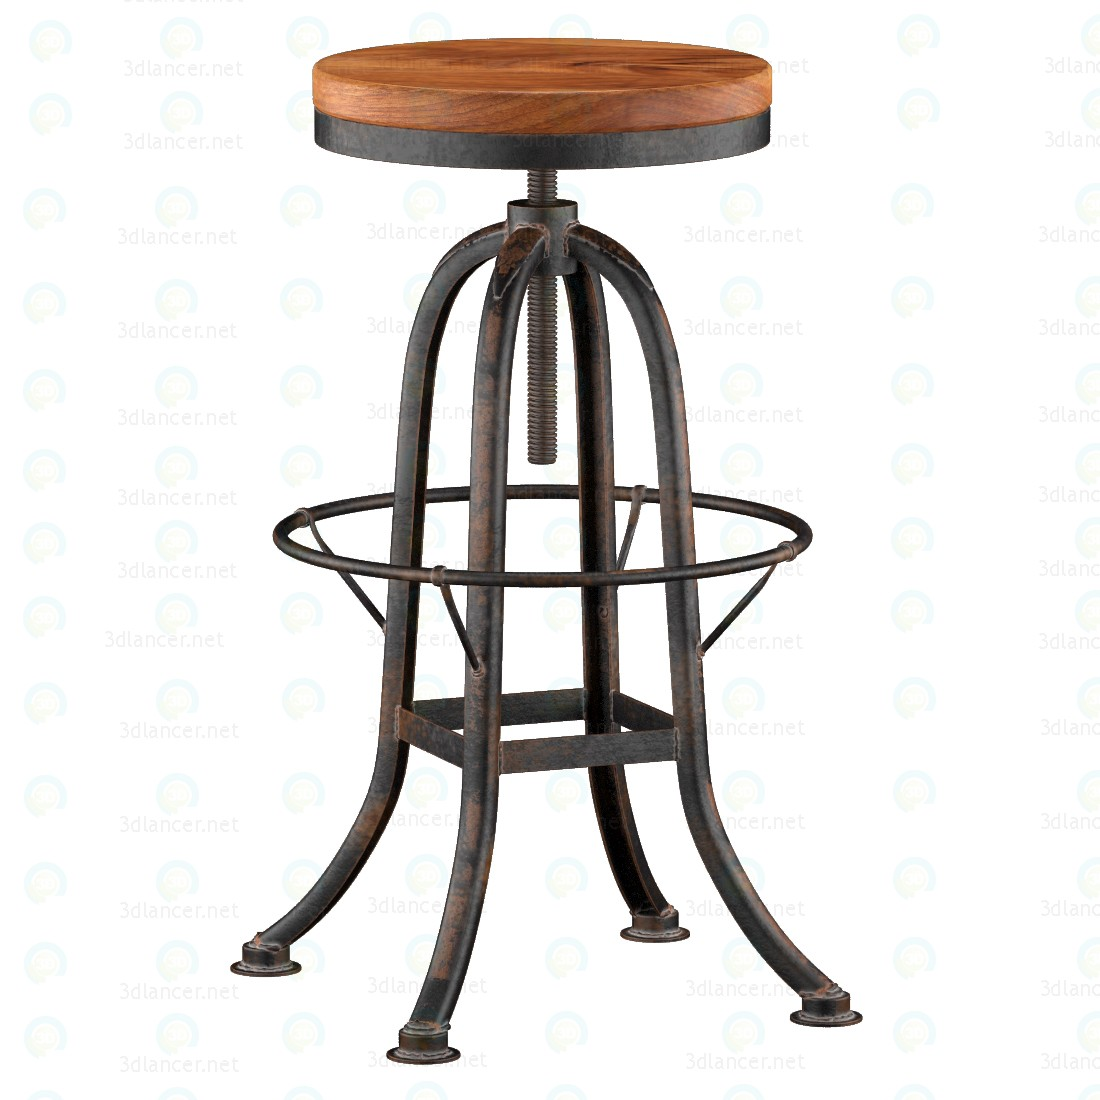 3d  Industrial loft Iron Base Reclaimed  Wood Bar Counter Stool  model buy - render